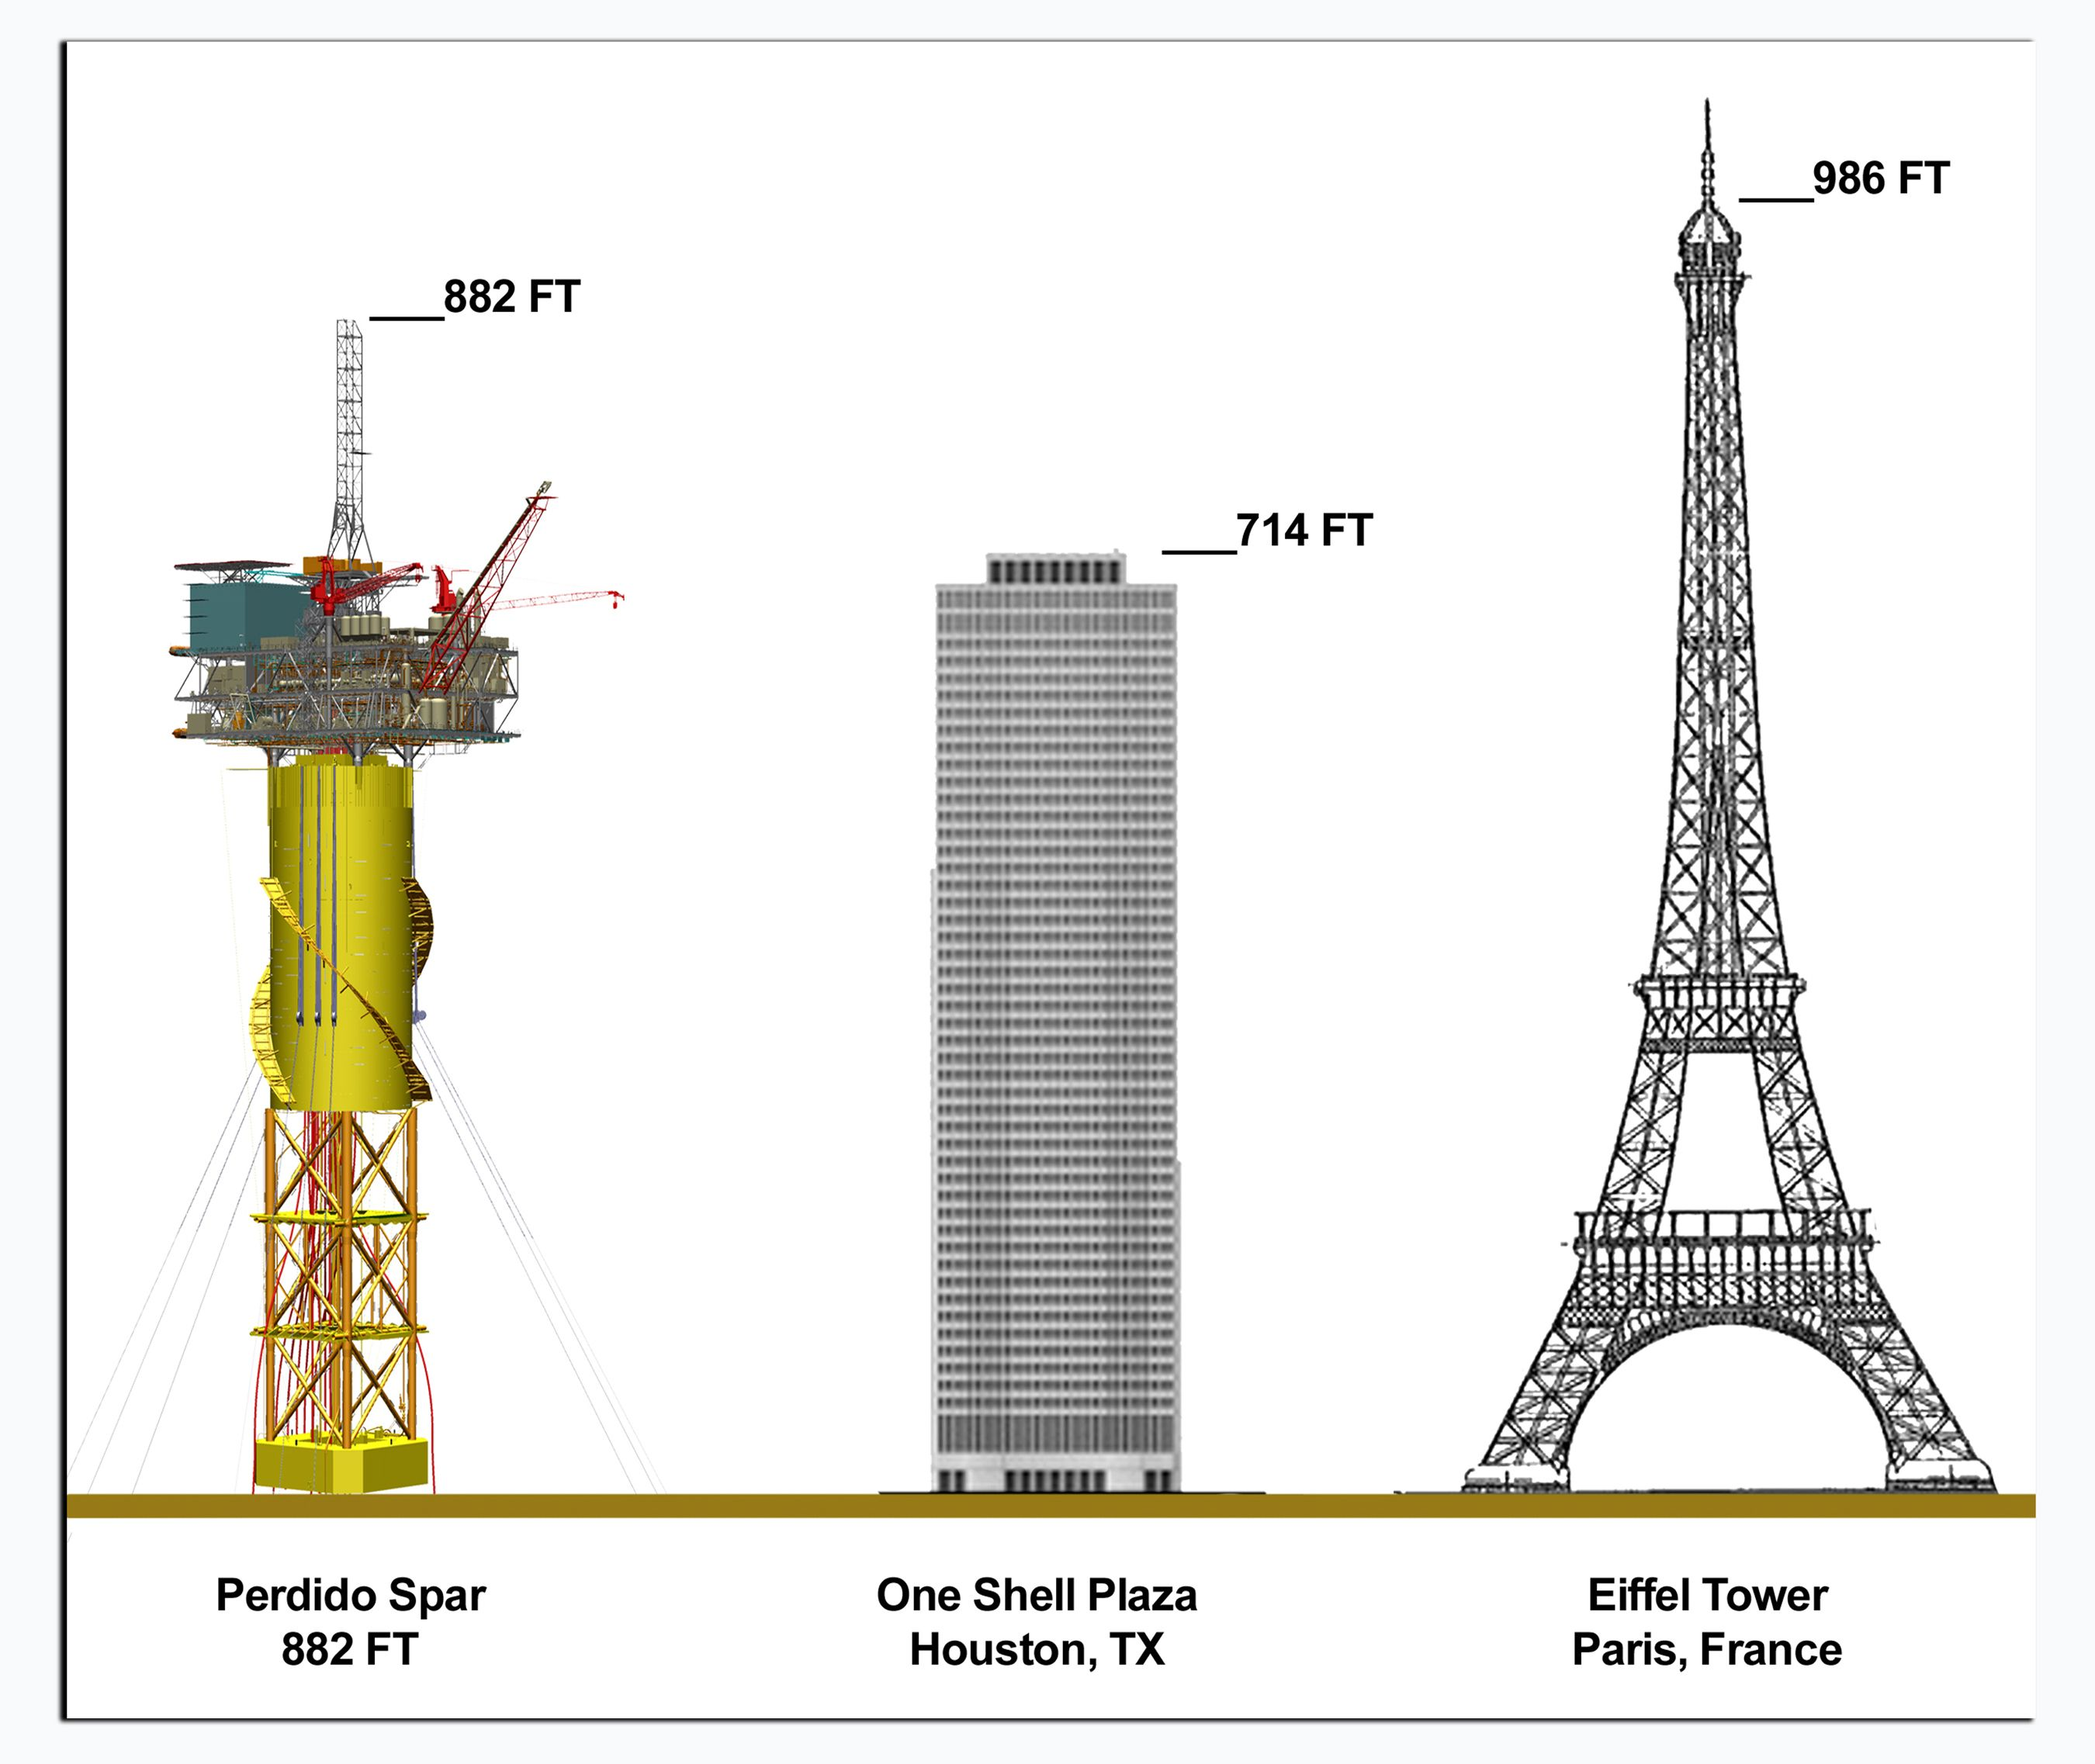 Perdido (8000' WD) | Oil & Gas Industry | Drilling rig ...